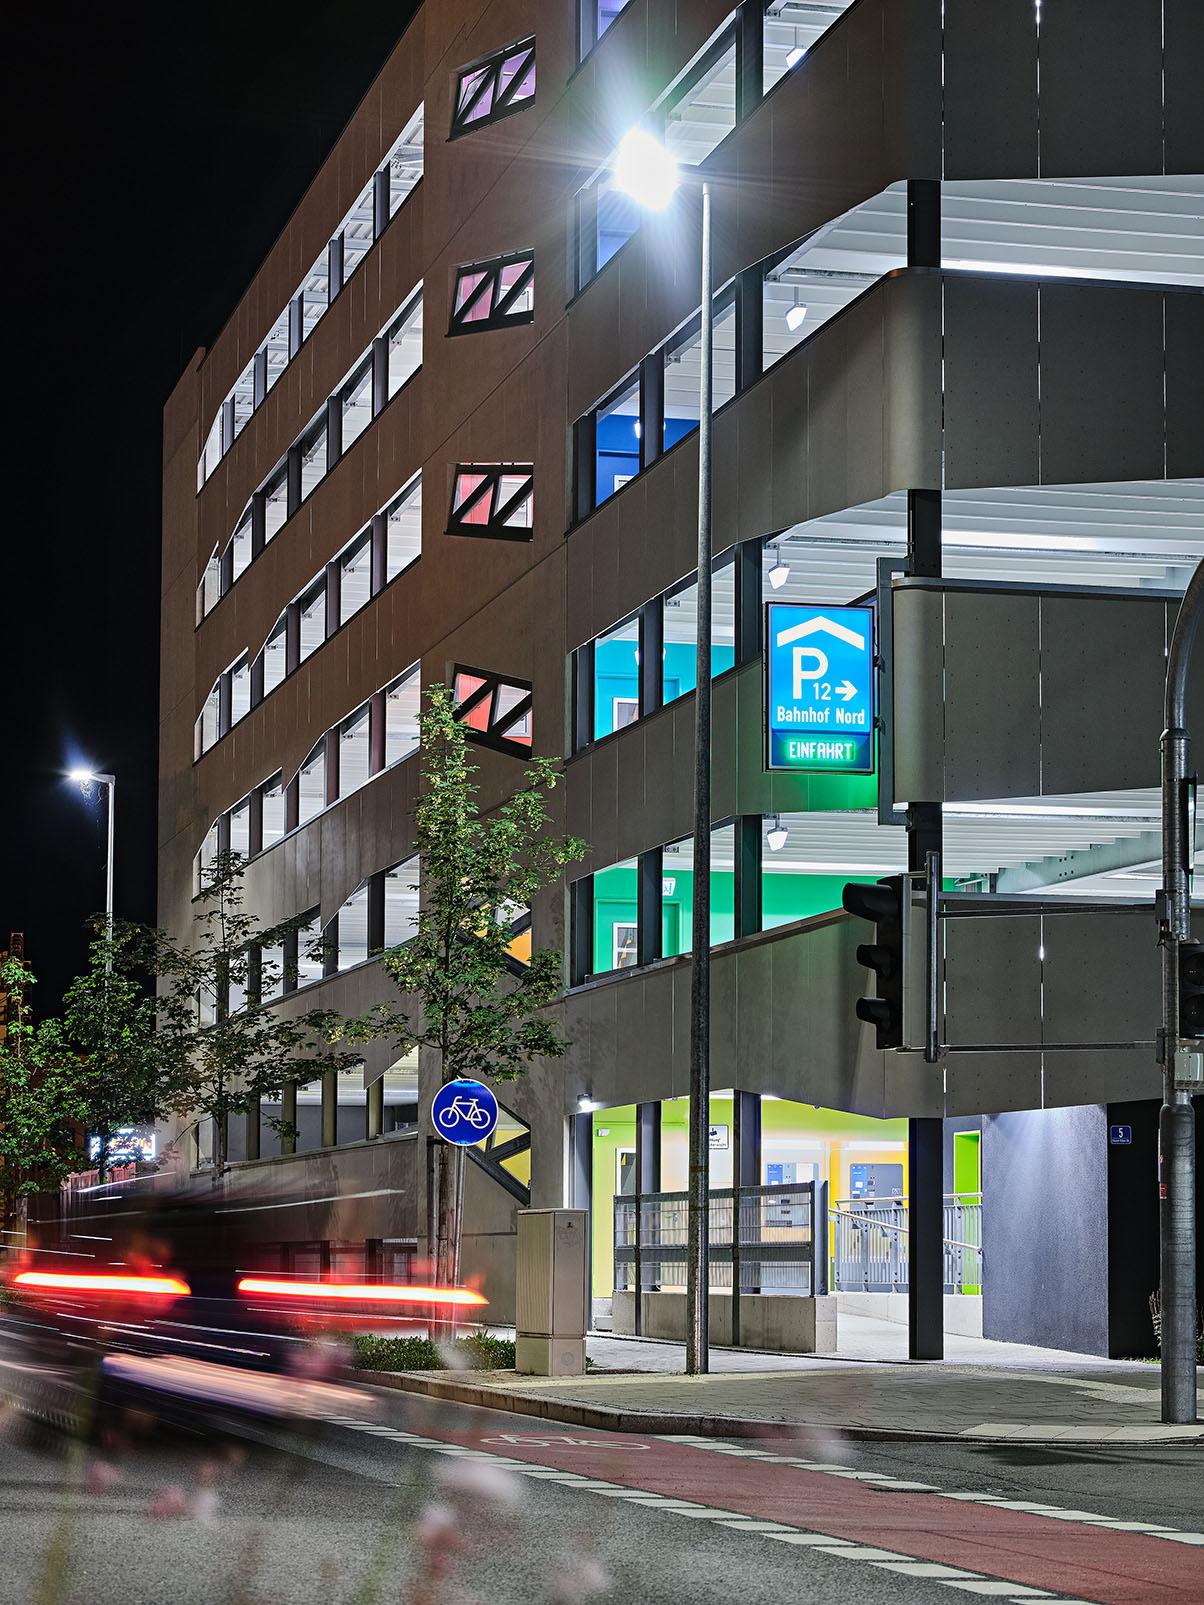 2020_07_20_HIB_Parkhaus_P12_Bahnhof_Nord_Rosenheim_NUM0539_1_0_rgb Kopie